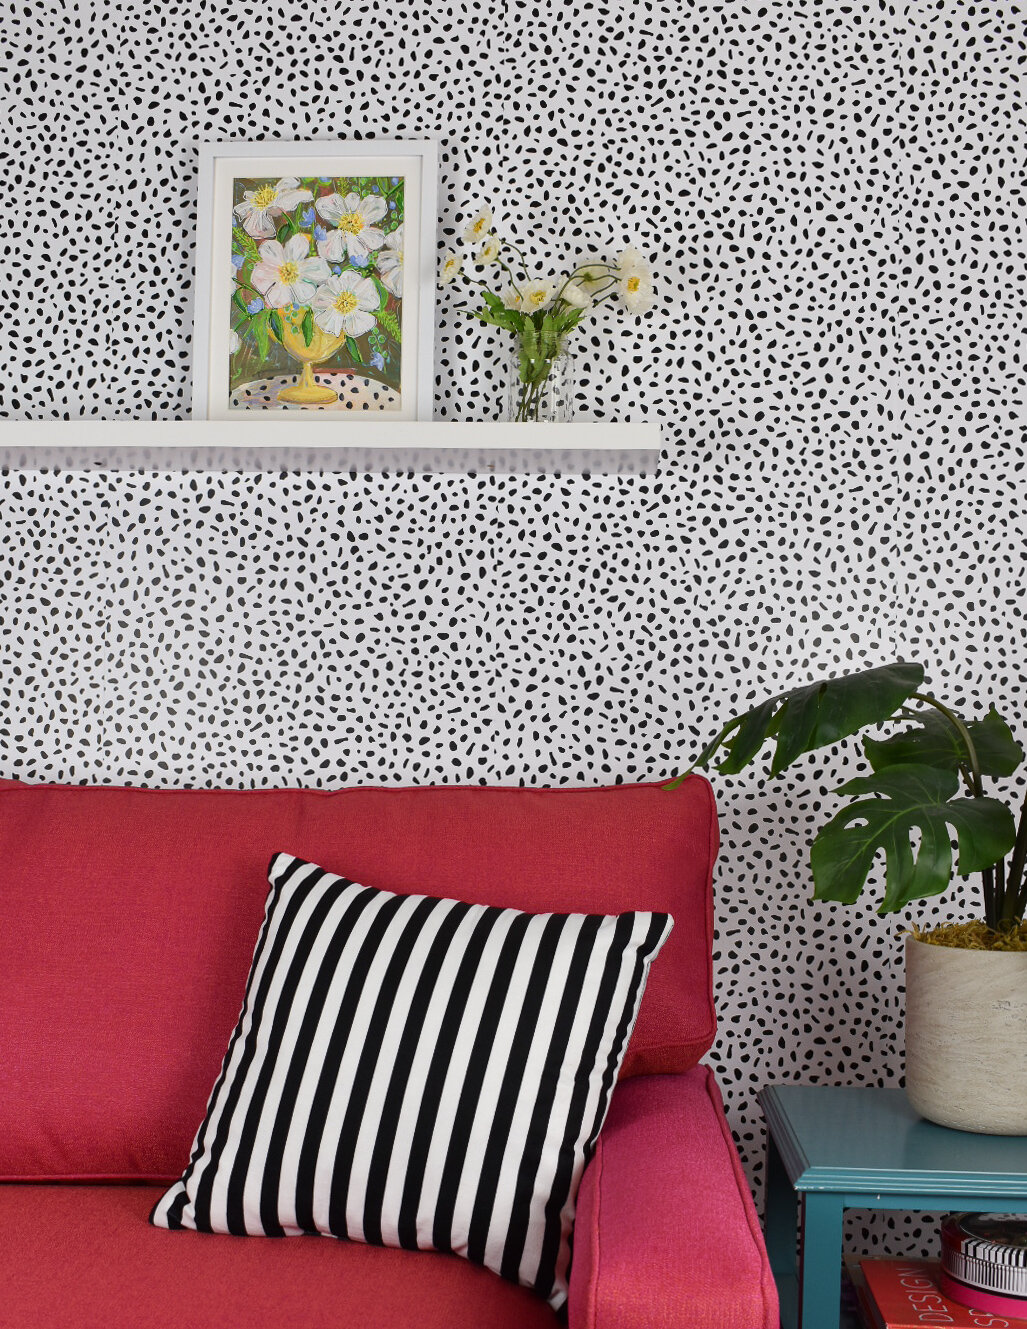 boho_painting_art_poppies_daisyfaithart_3.jpg